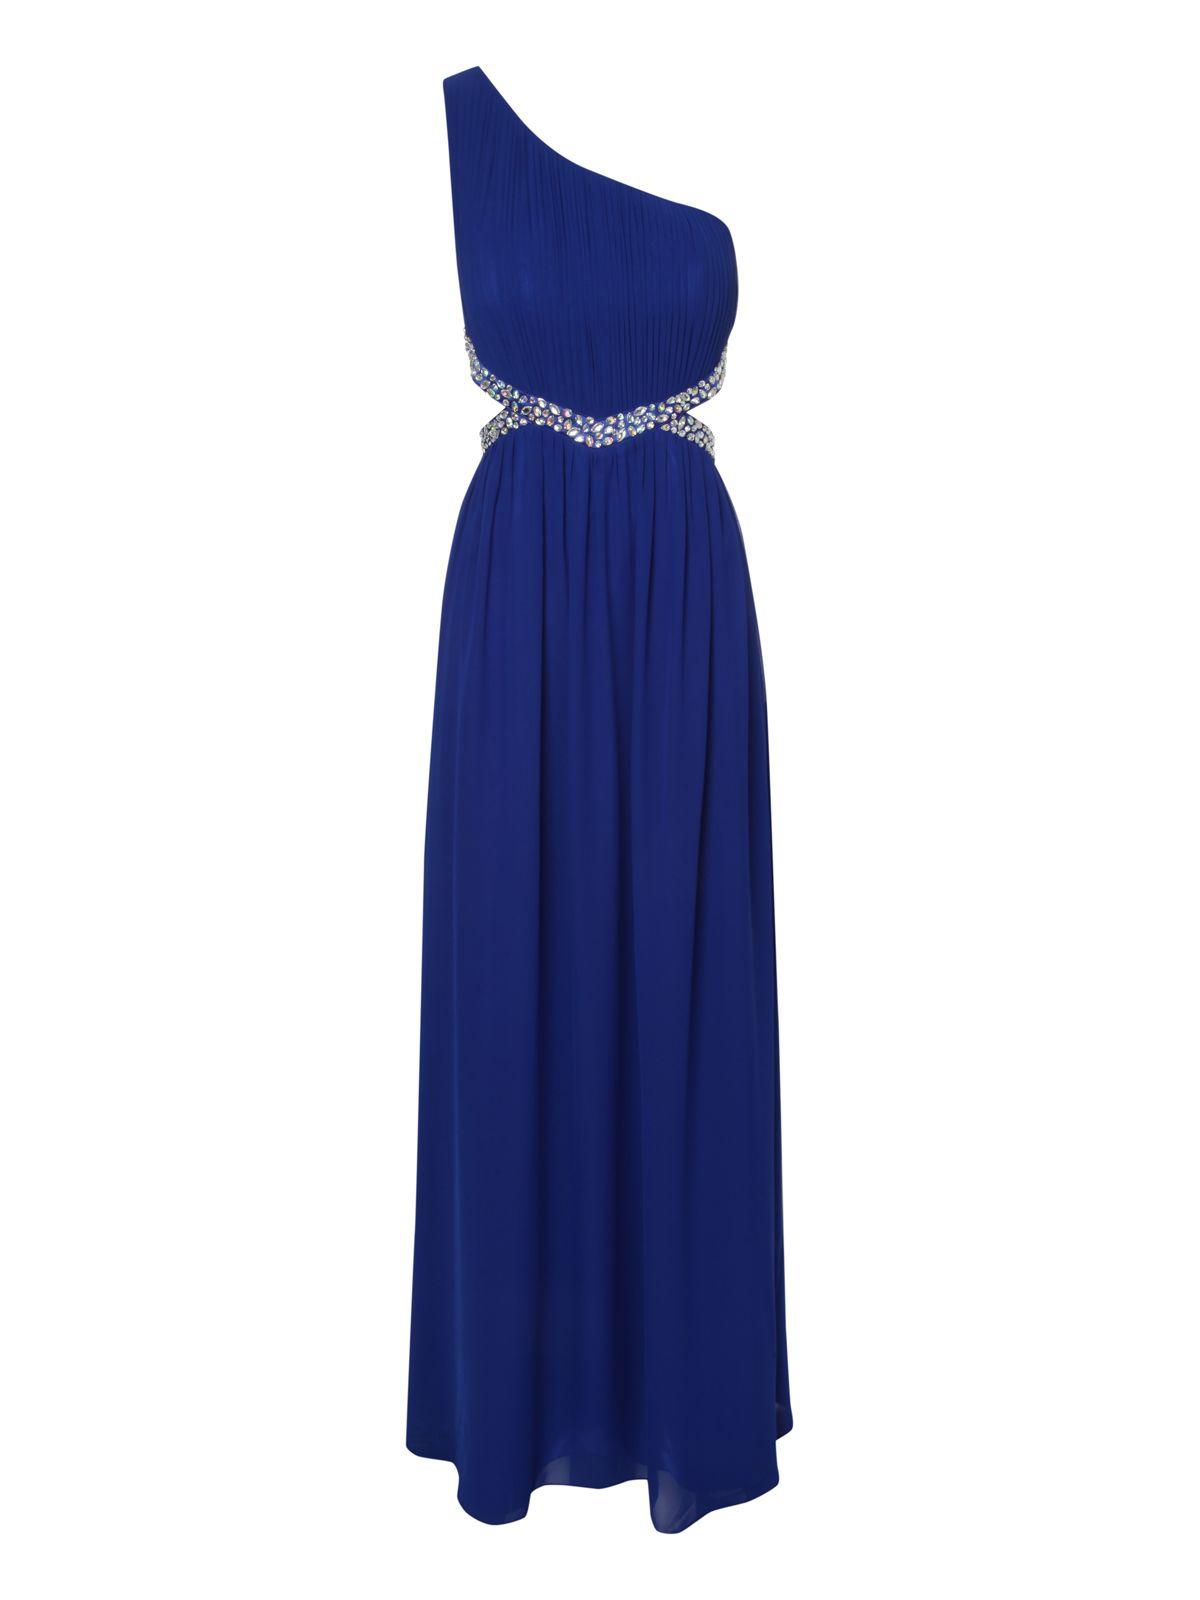 For juniors jane norman maxi dress sale photos